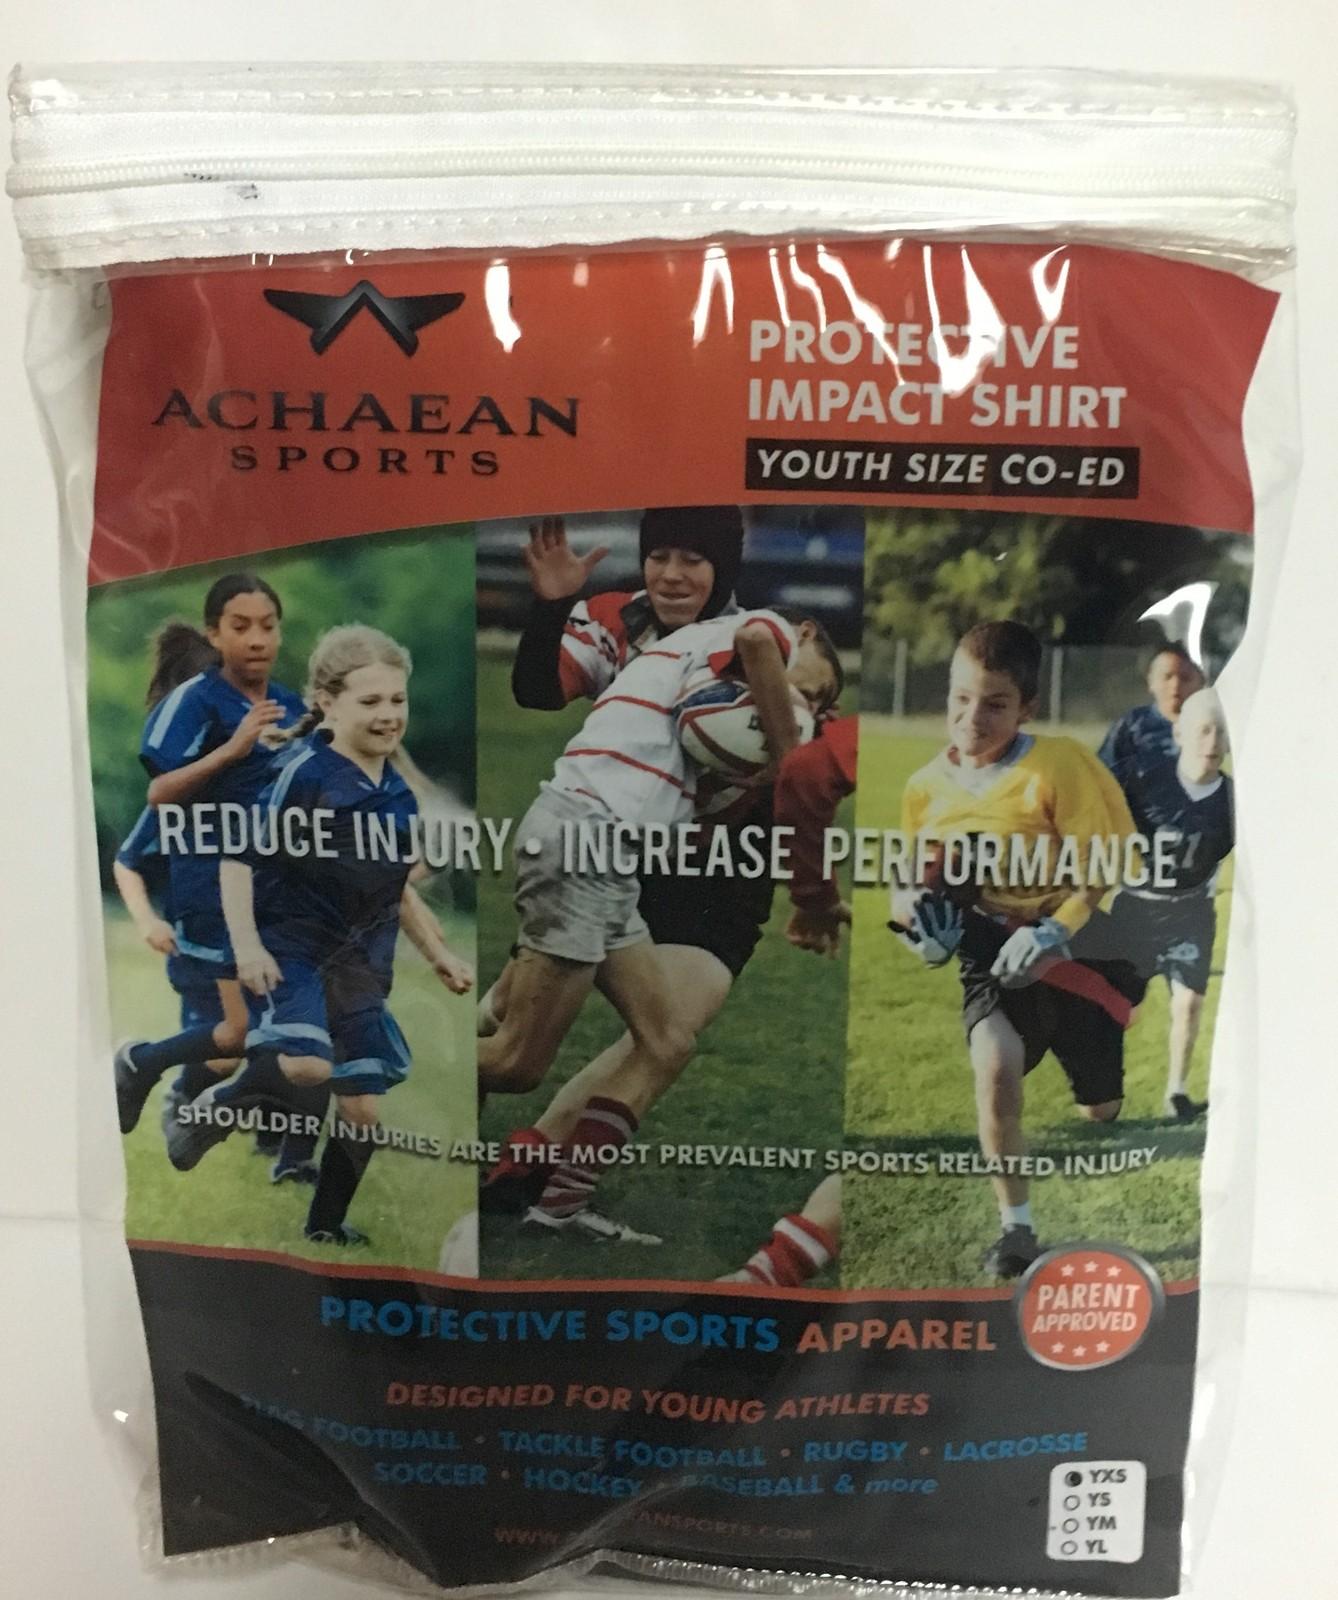 Achaean Sports Protective Impact Shirt Youth Sizes Boys & Girls Black image 4